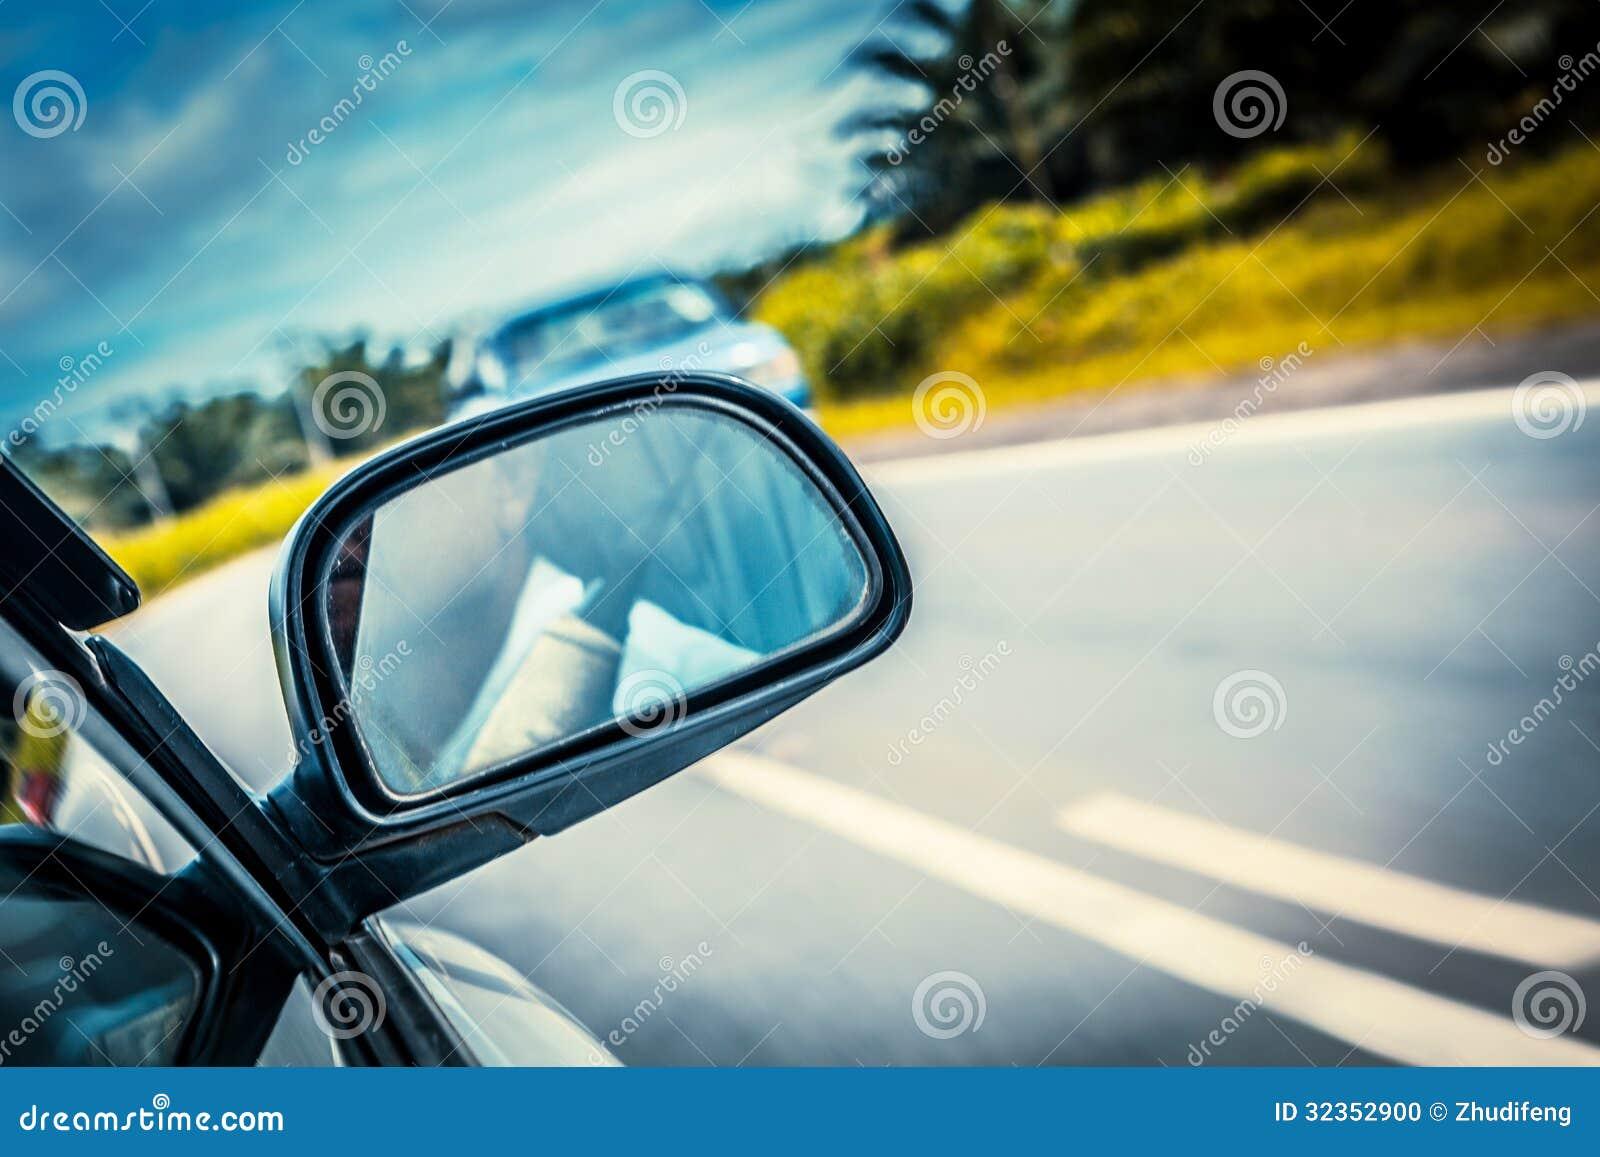 Dreams Of An Empty Car Driving